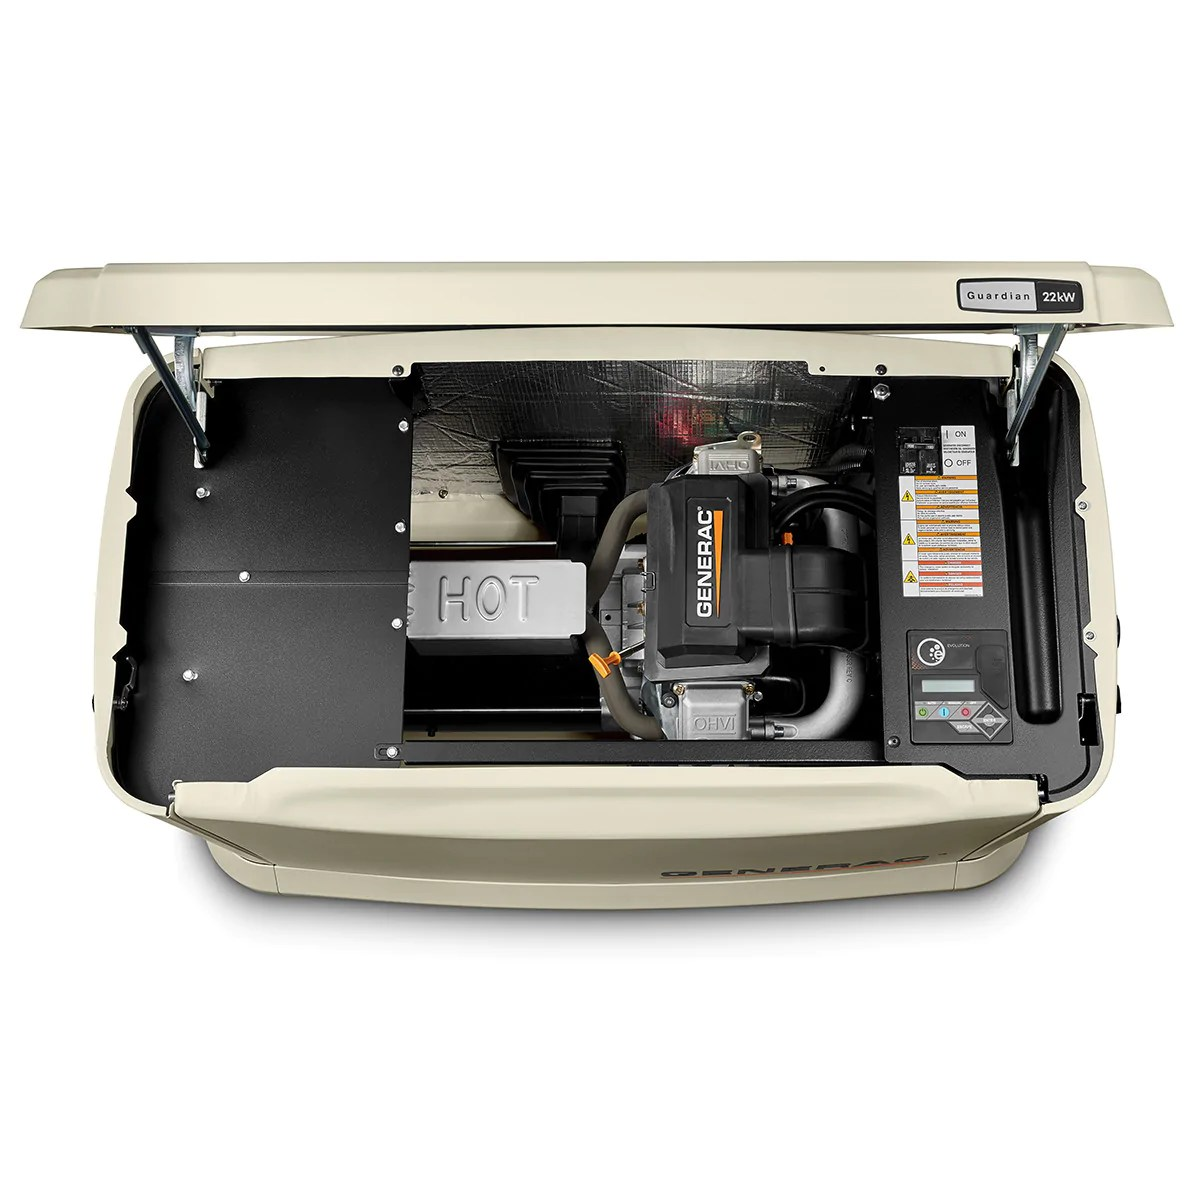 small resolution of generac guardian 7042 22kw aluminum automatic standby generator